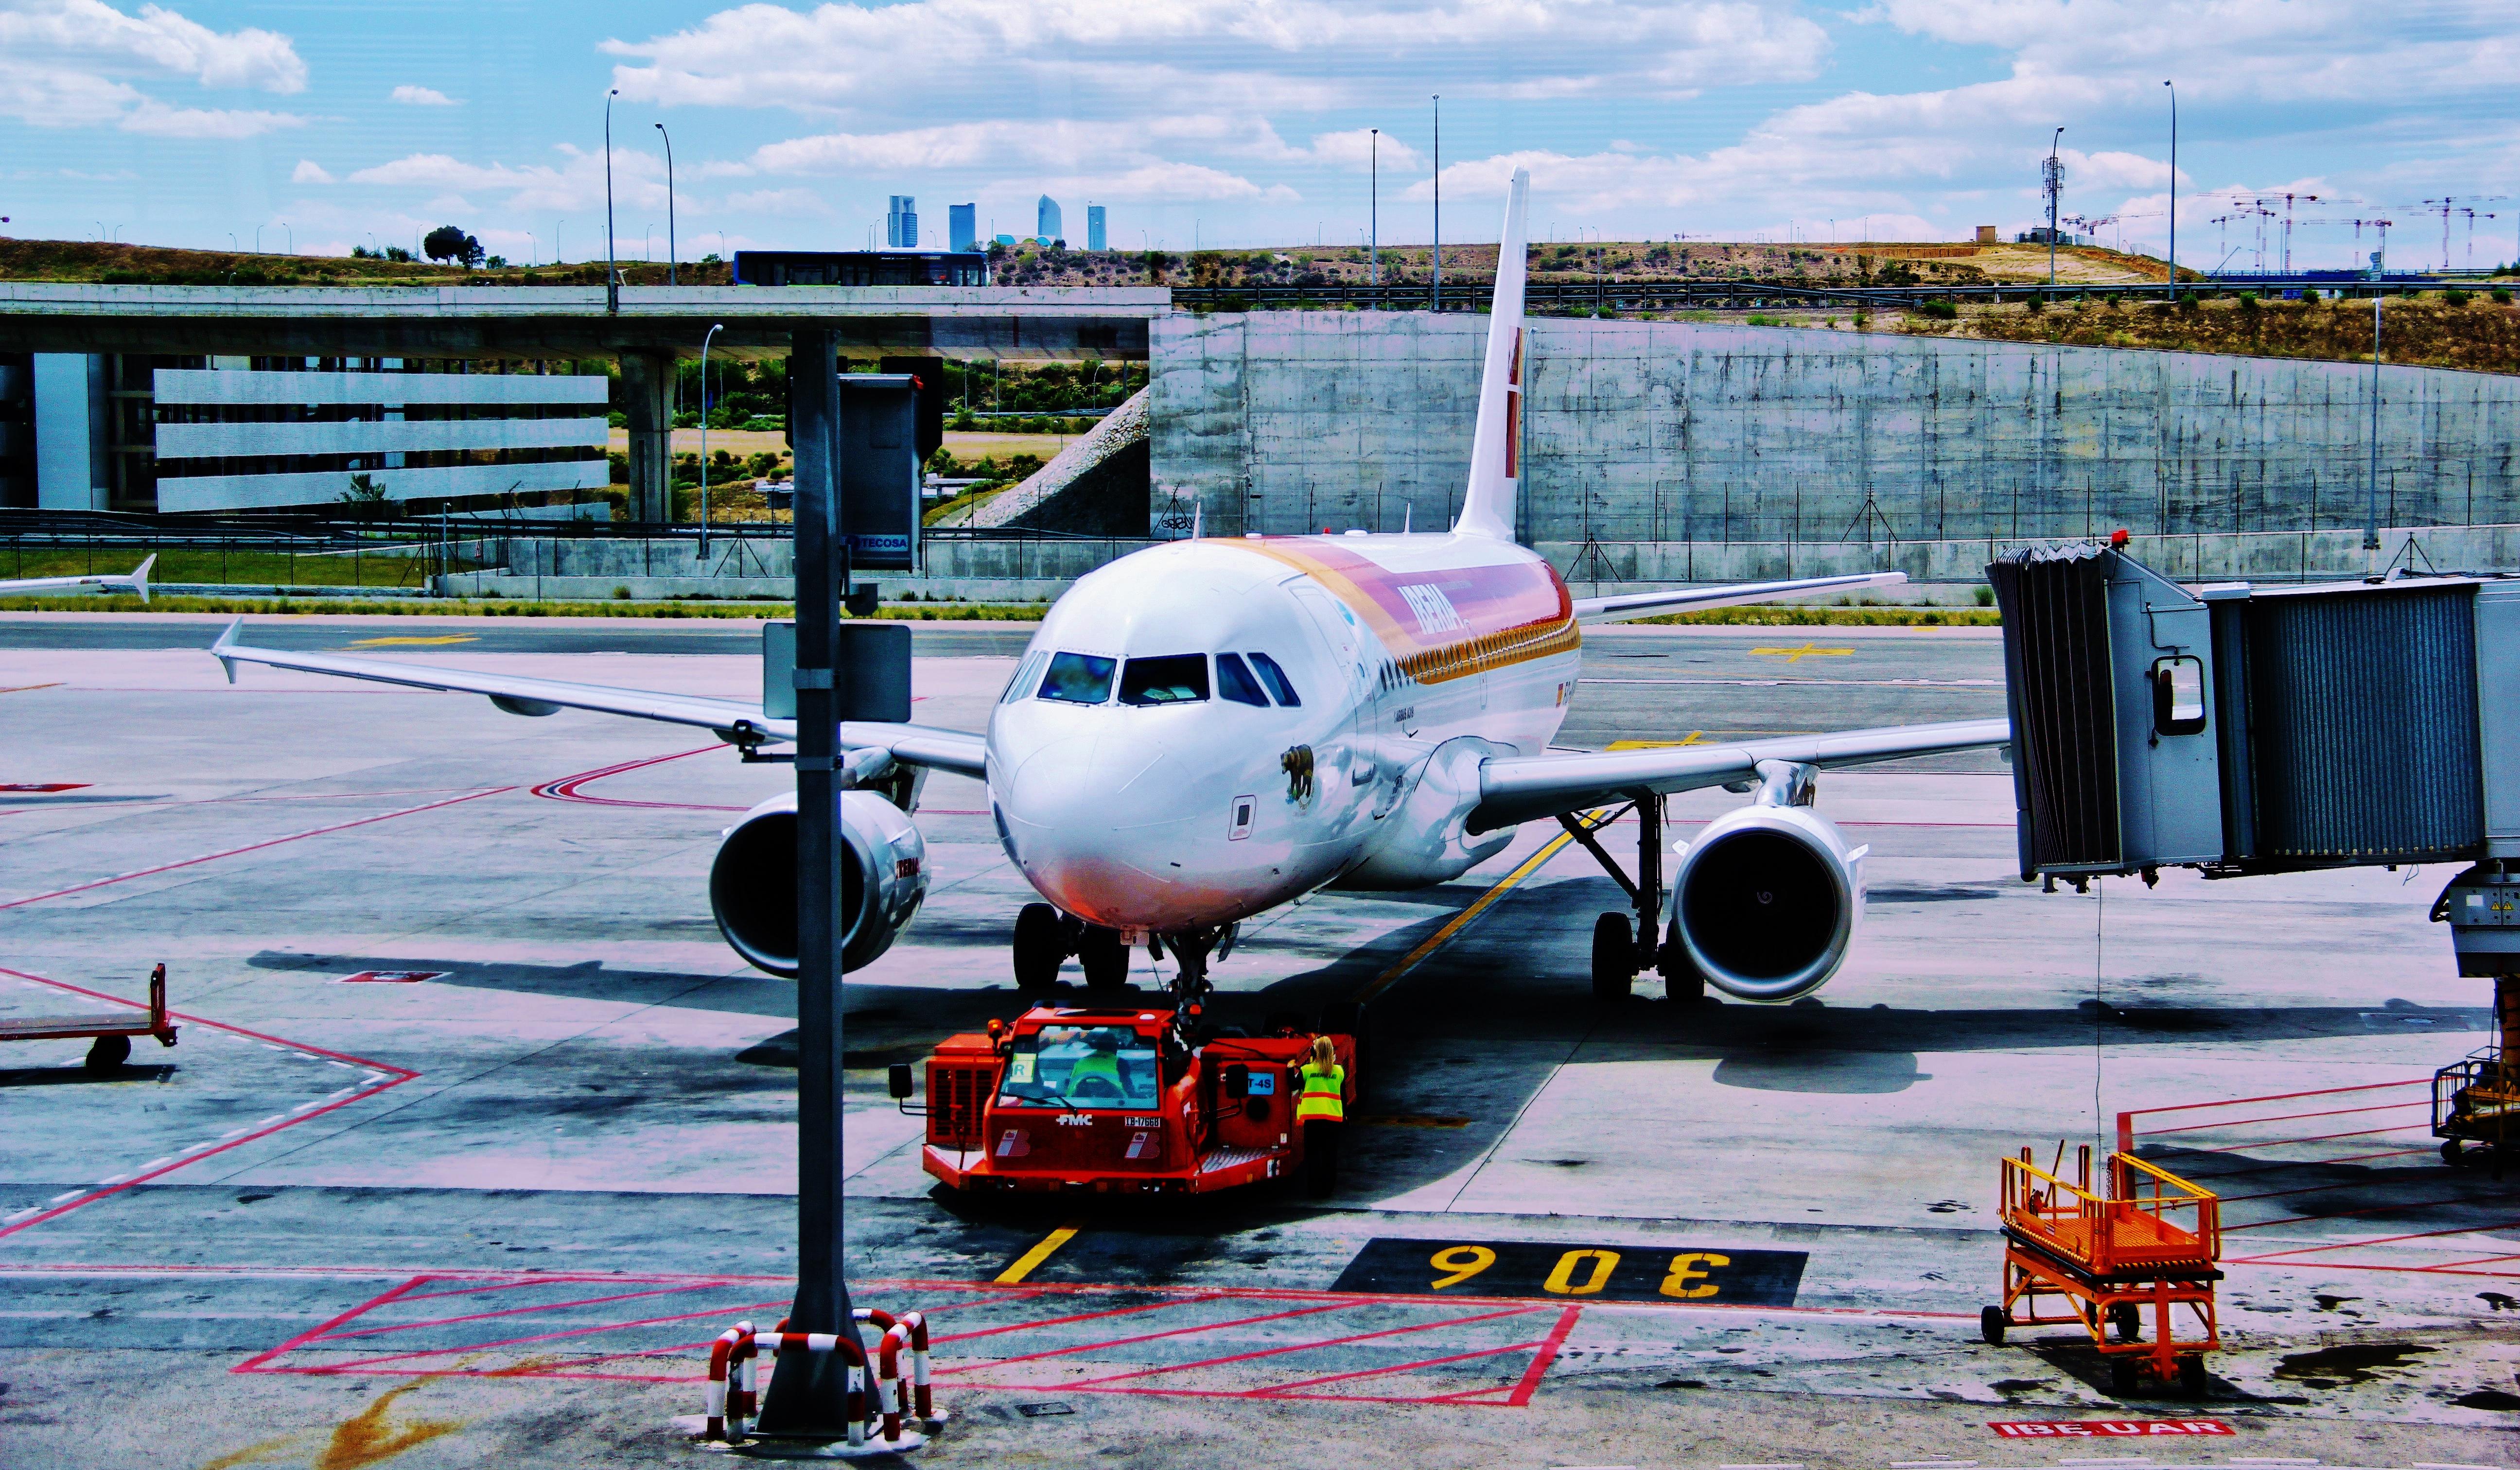 qBUS7gZyT56yoqGcdnyX_airlines